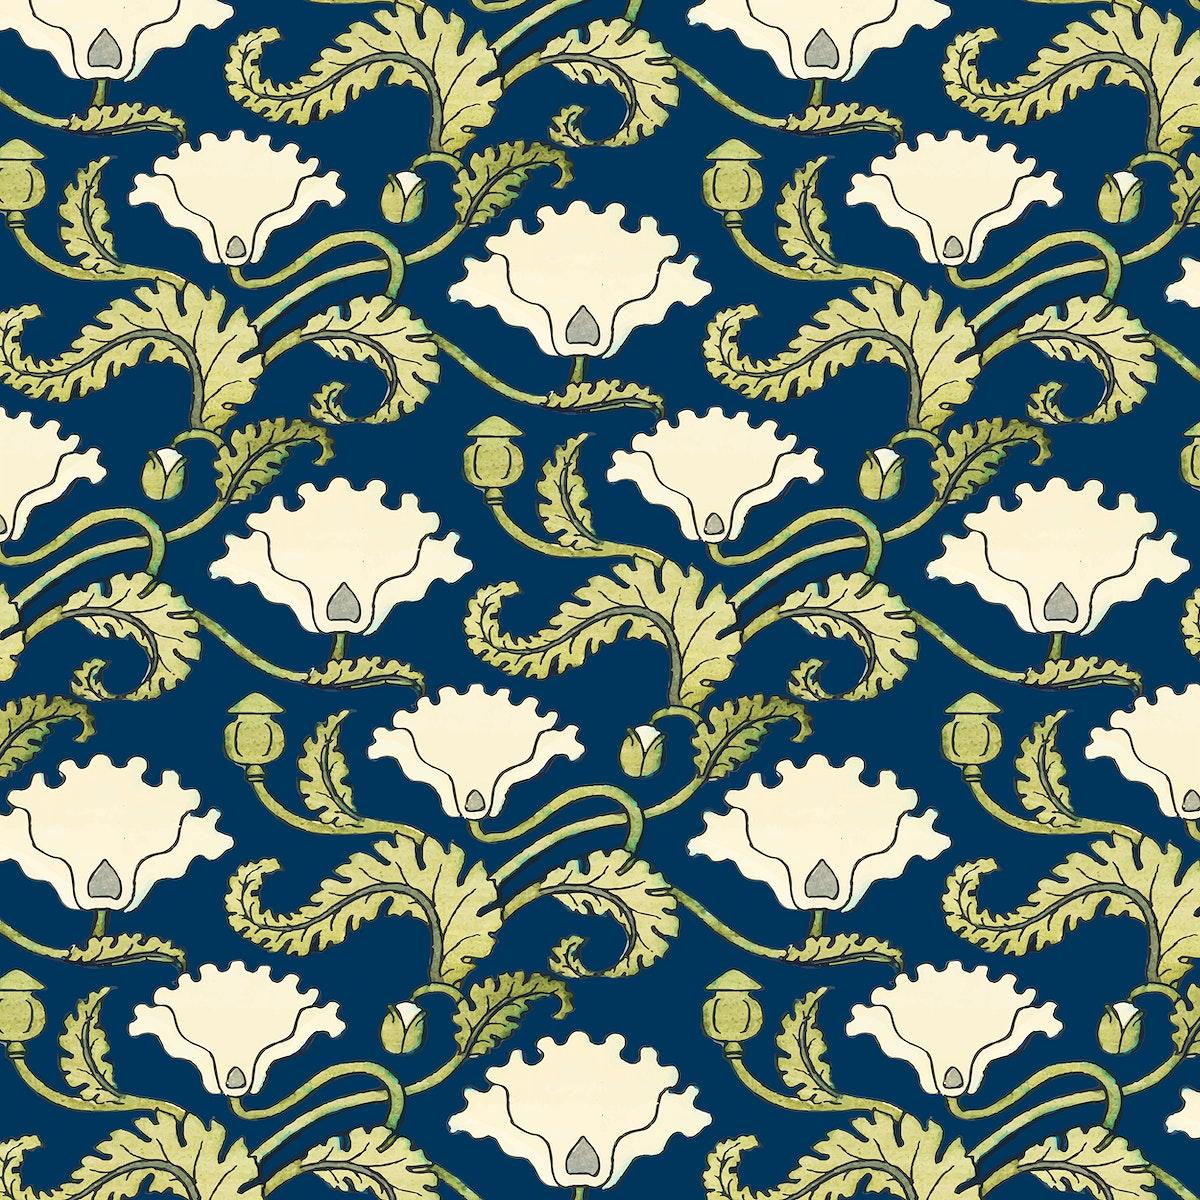 Art nouveau poppy flower vector pattern design resource